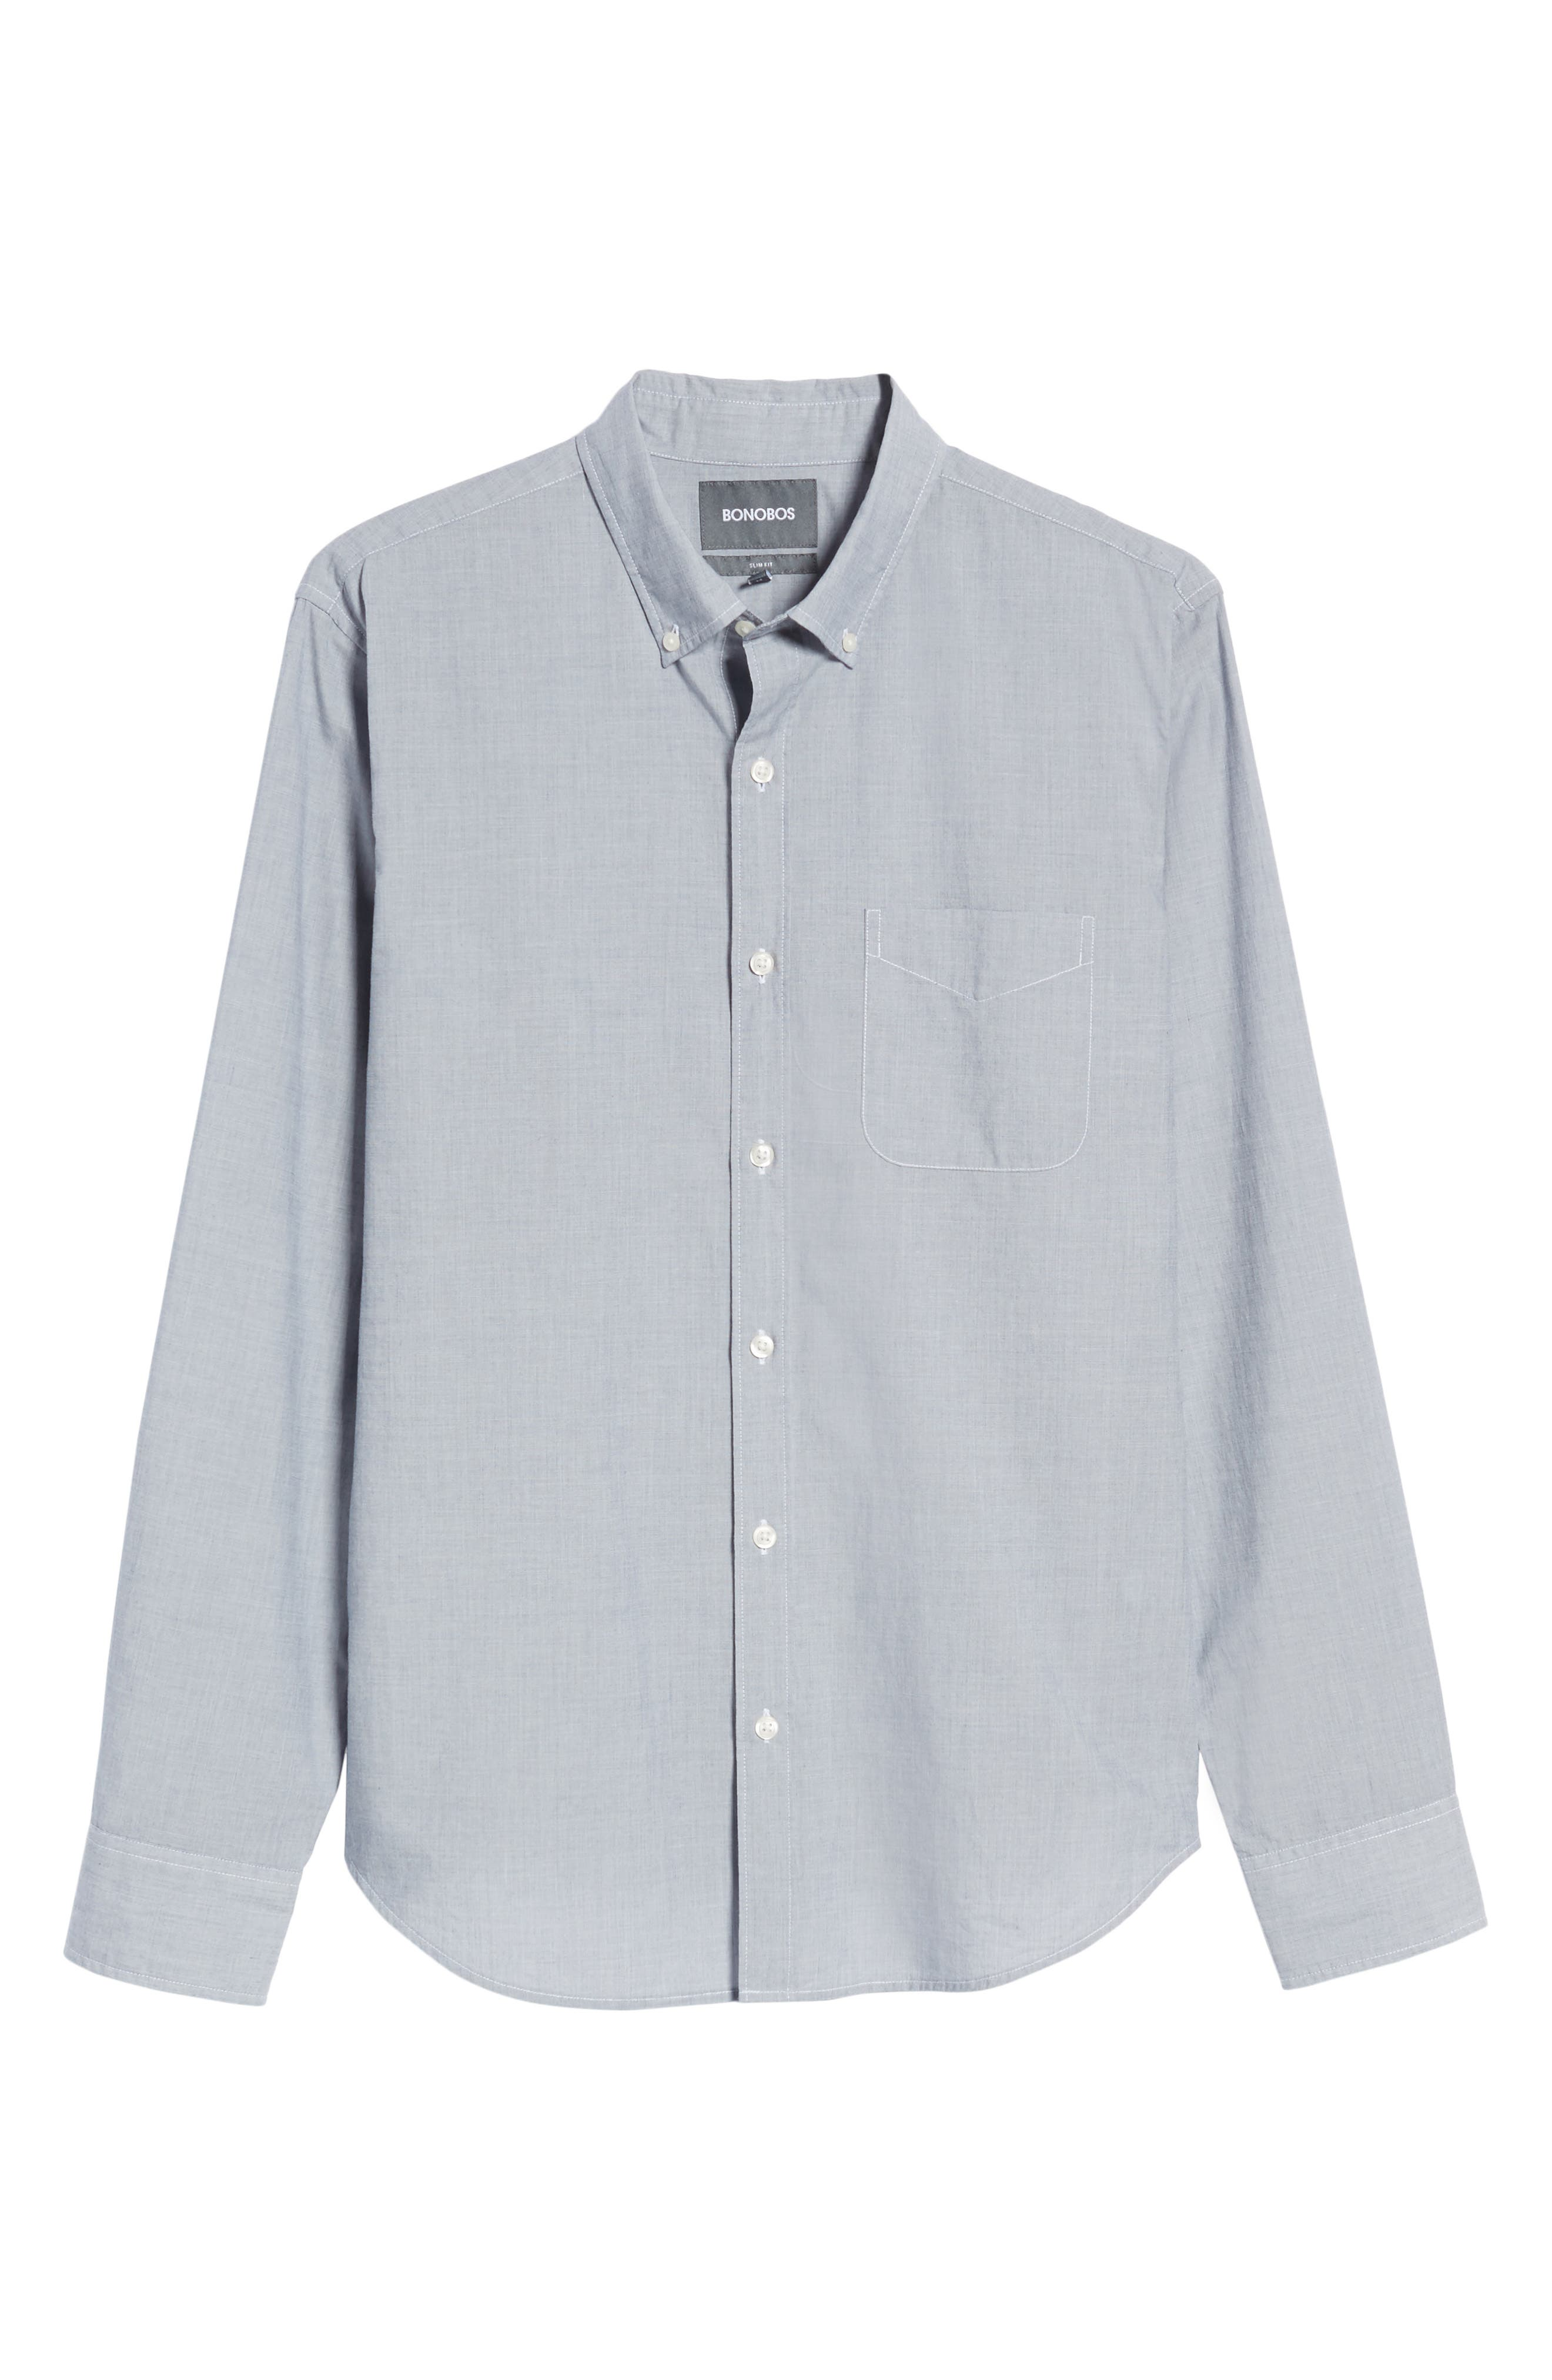 Summerweight Slim Fit Sport Shirt,                             Alternate thumbnail 6, color,                             End On End Solid - Blue Depths